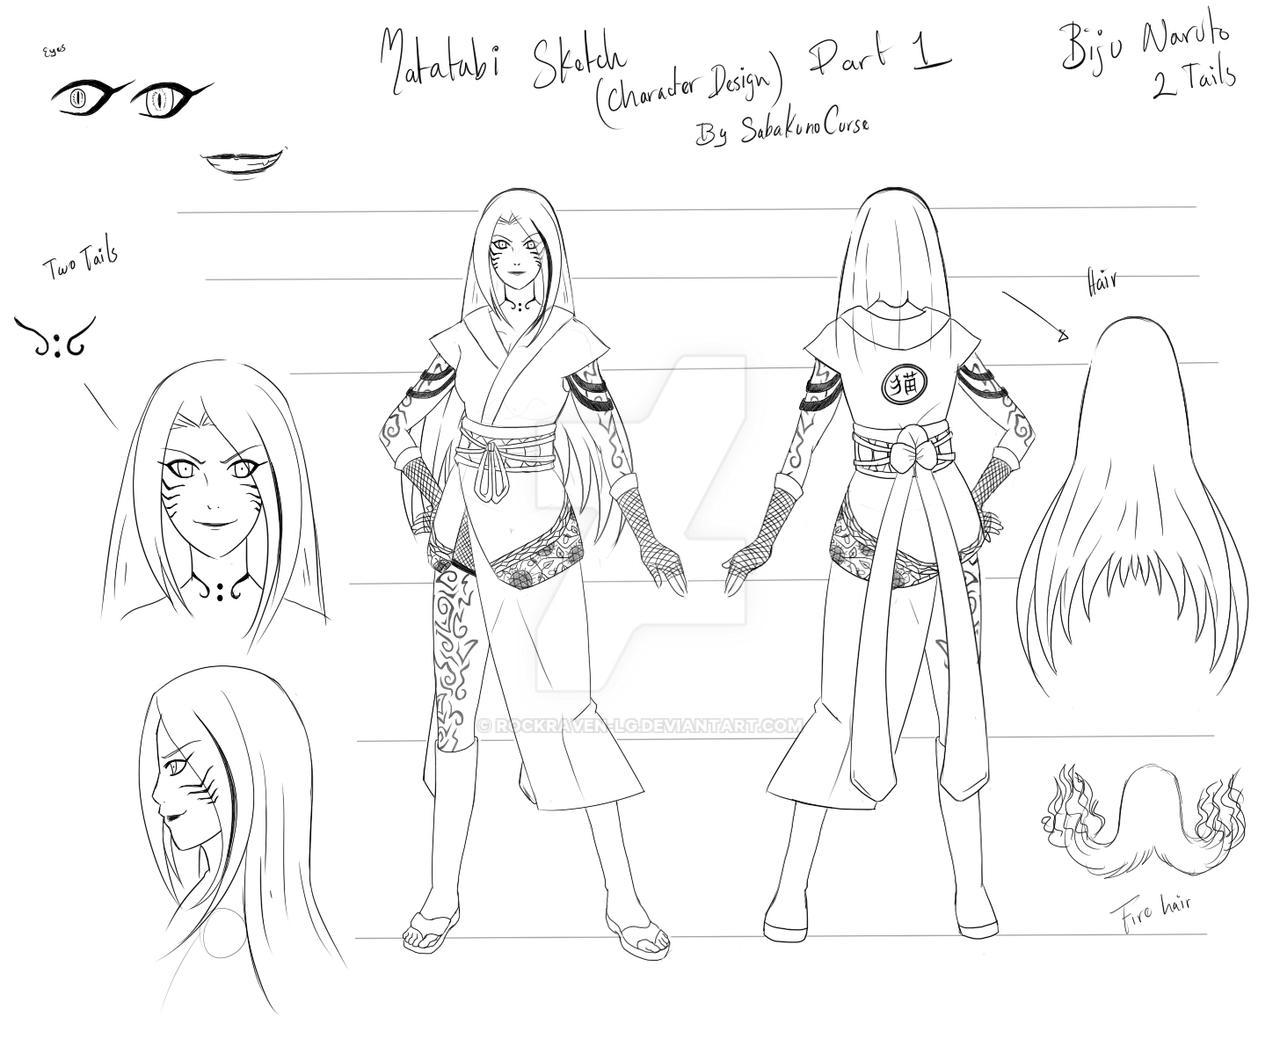 Matatabi_Nekomata_human bijus design by RockRaven-LG on DeviantArt